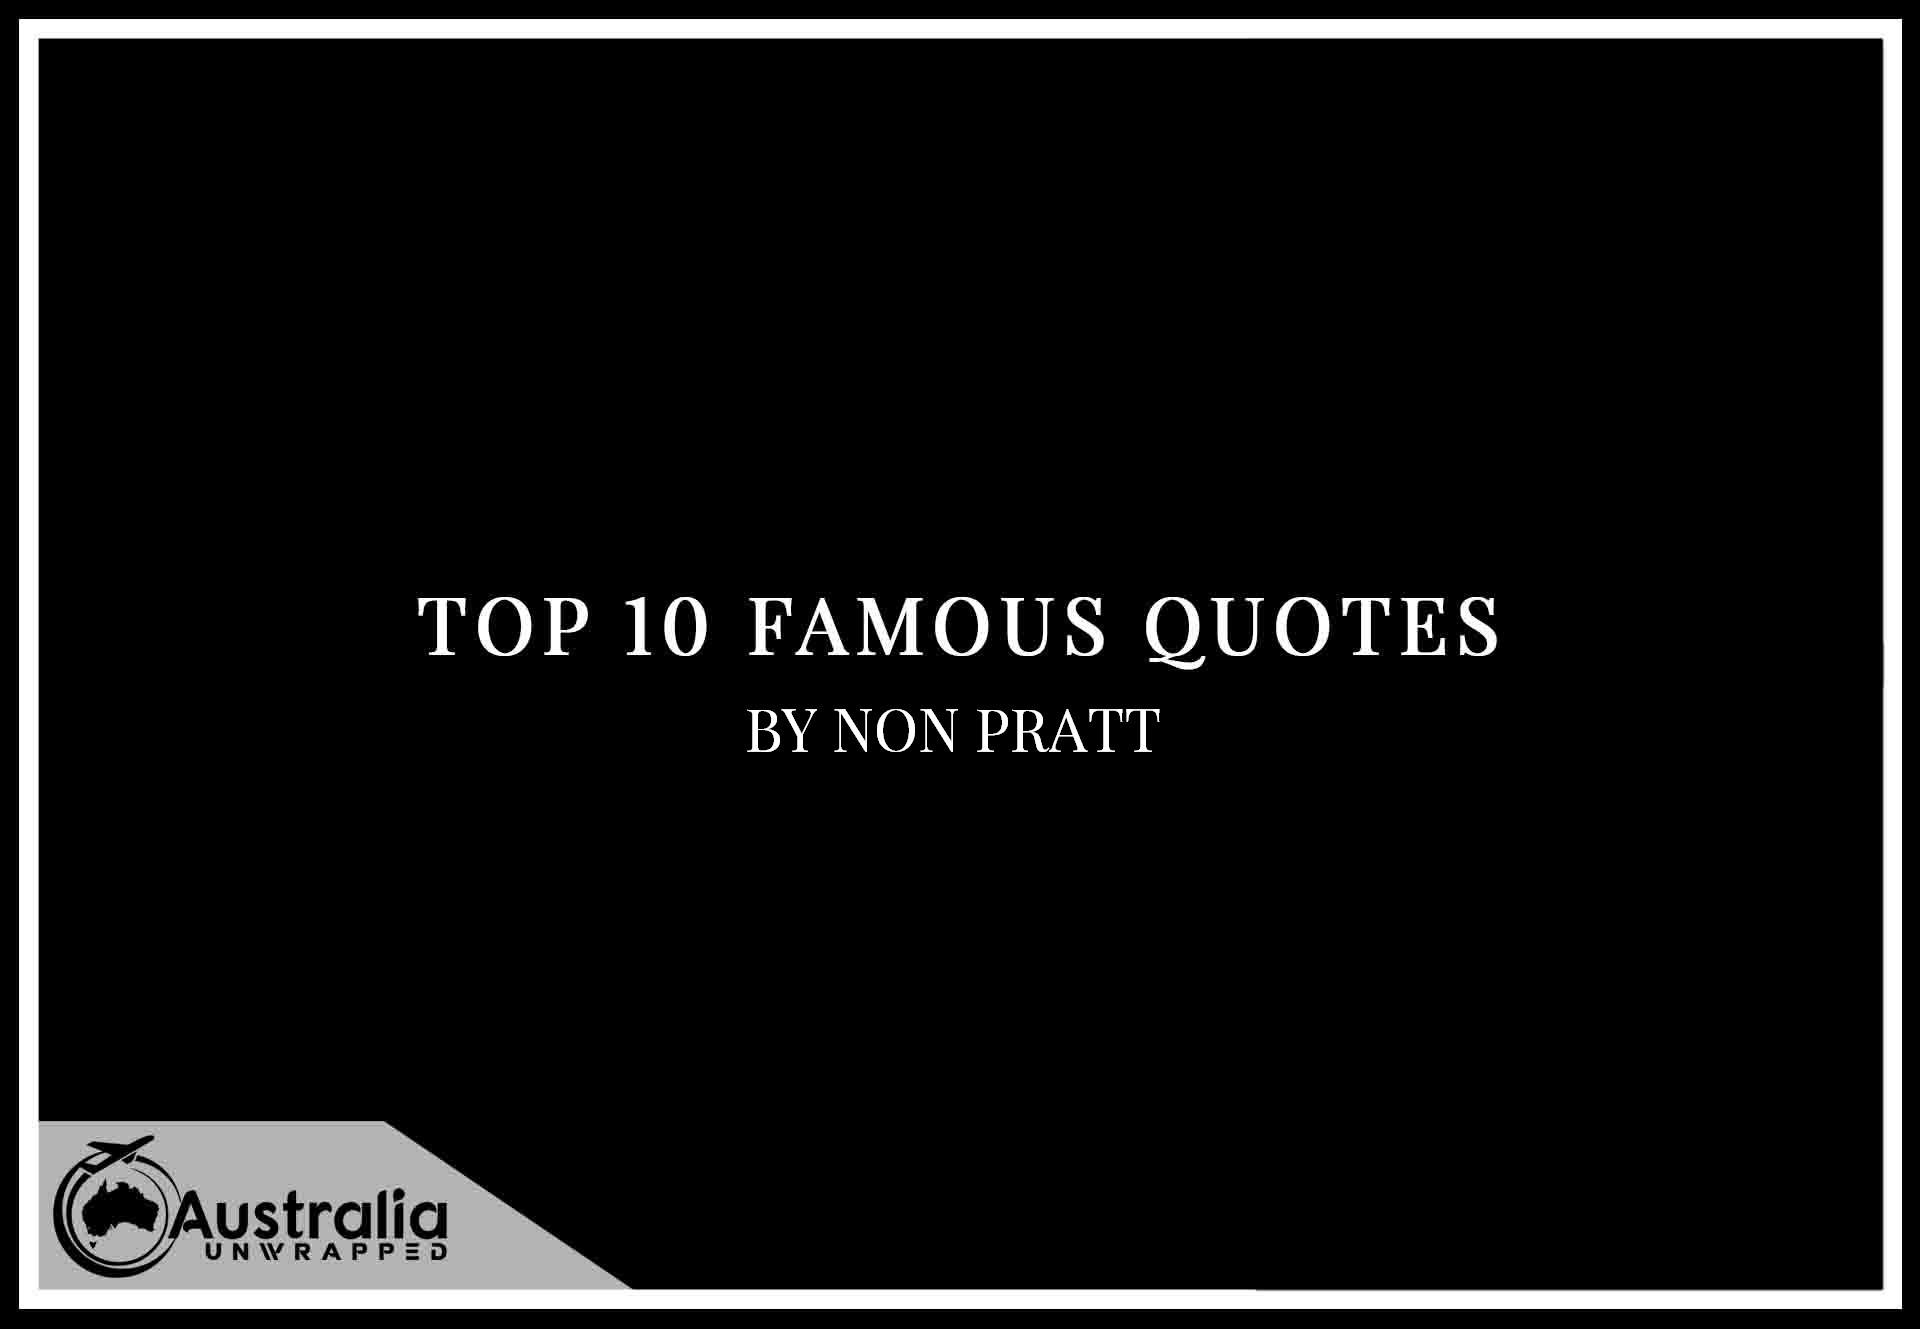 Top 10 Famous Quotes by Author Non Pratt